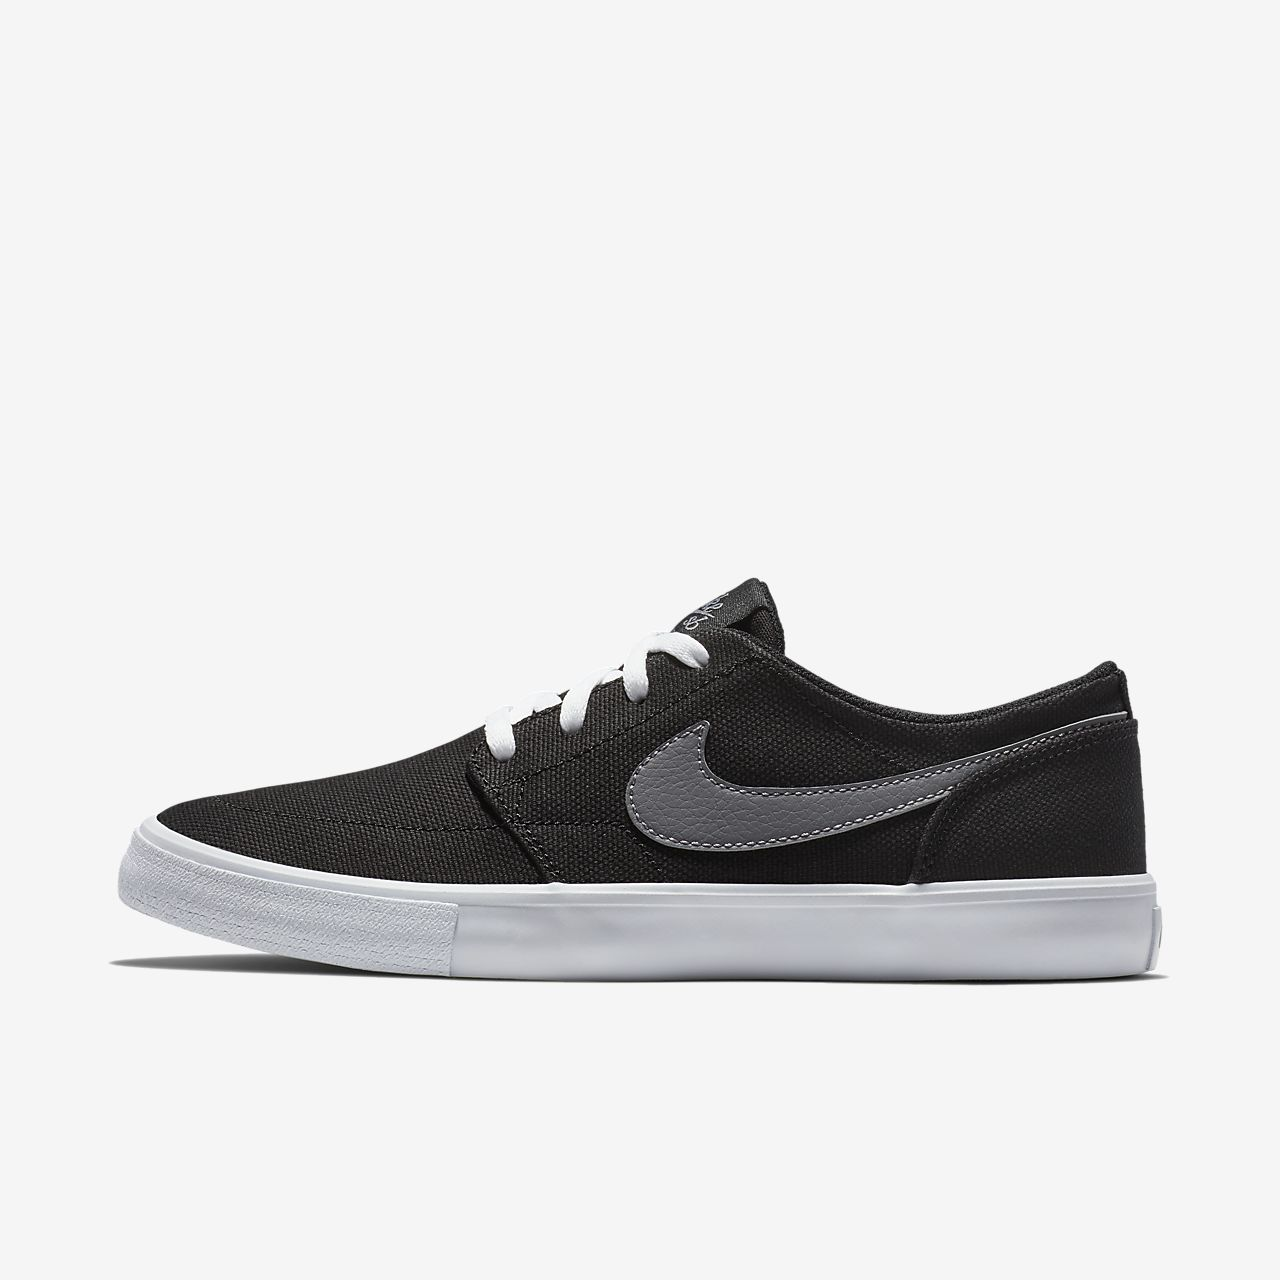 wholesale dealer a5793 6f5fc ... Nike SB Solarsoft Portmore II Women s Skateboarding Shoe